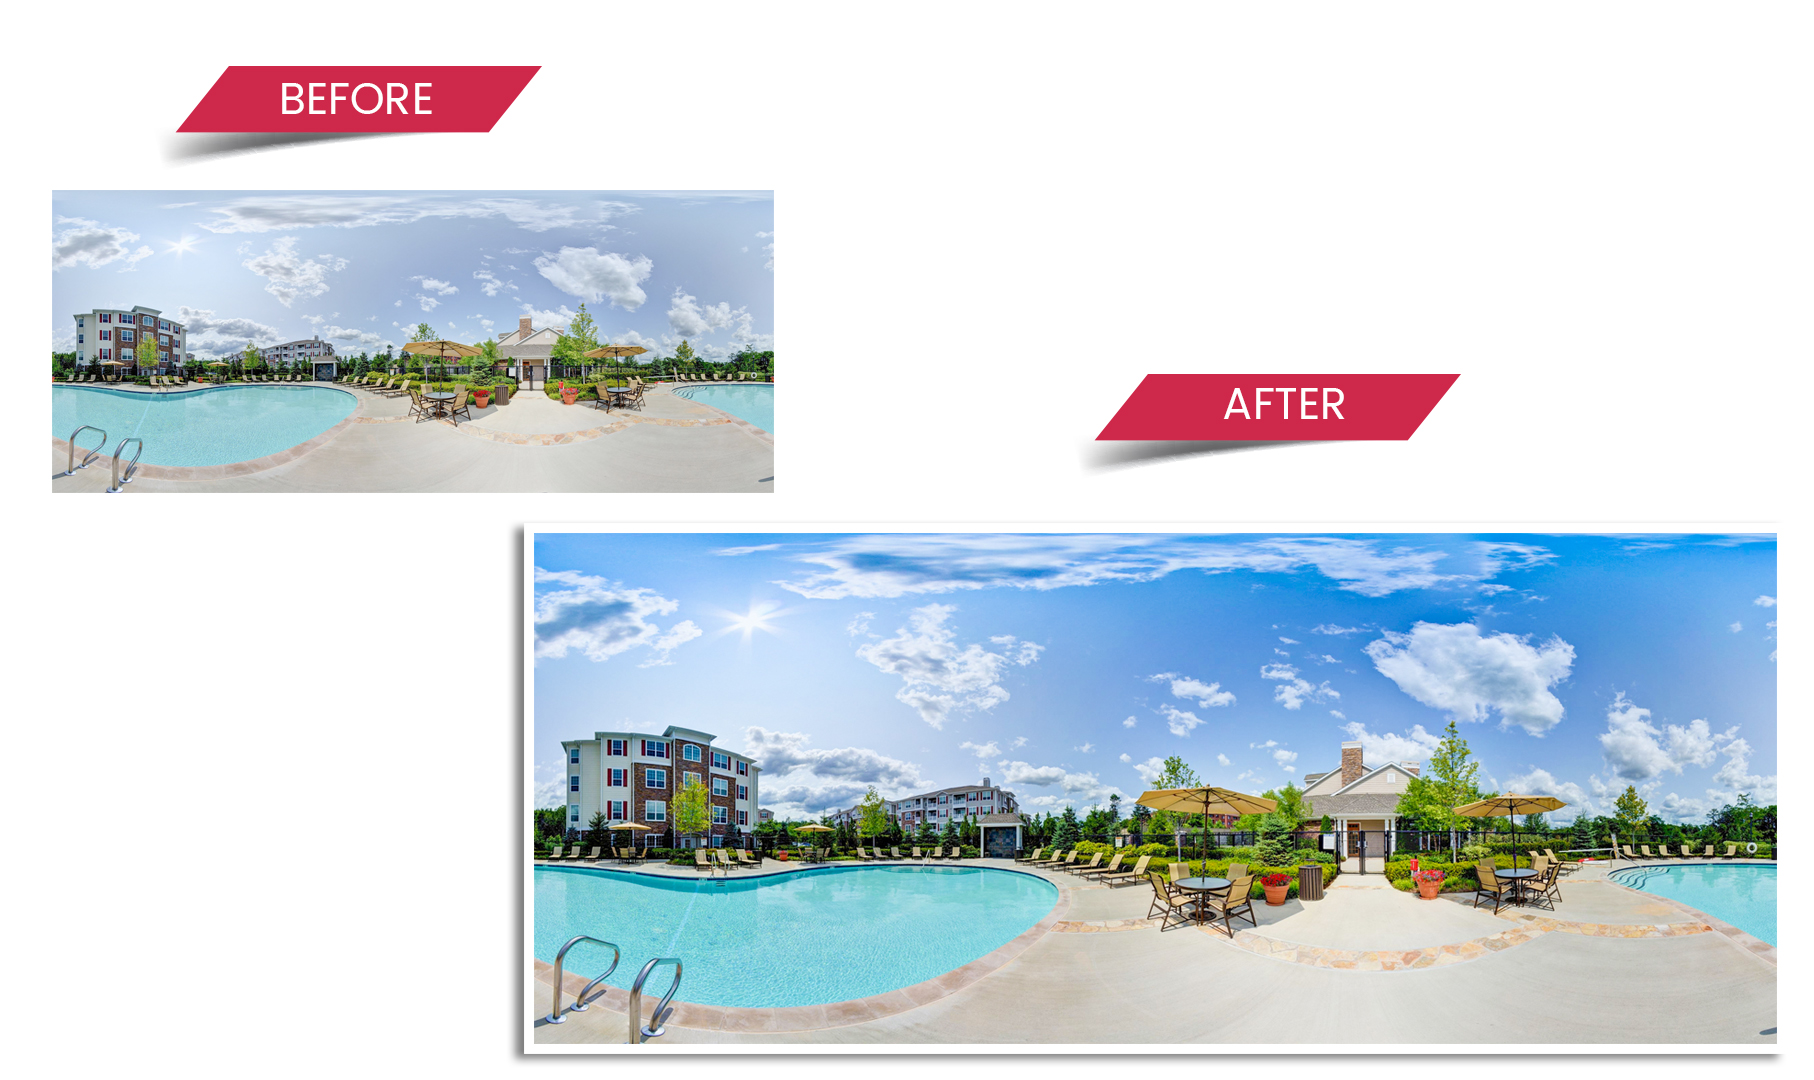 real estate panorama image